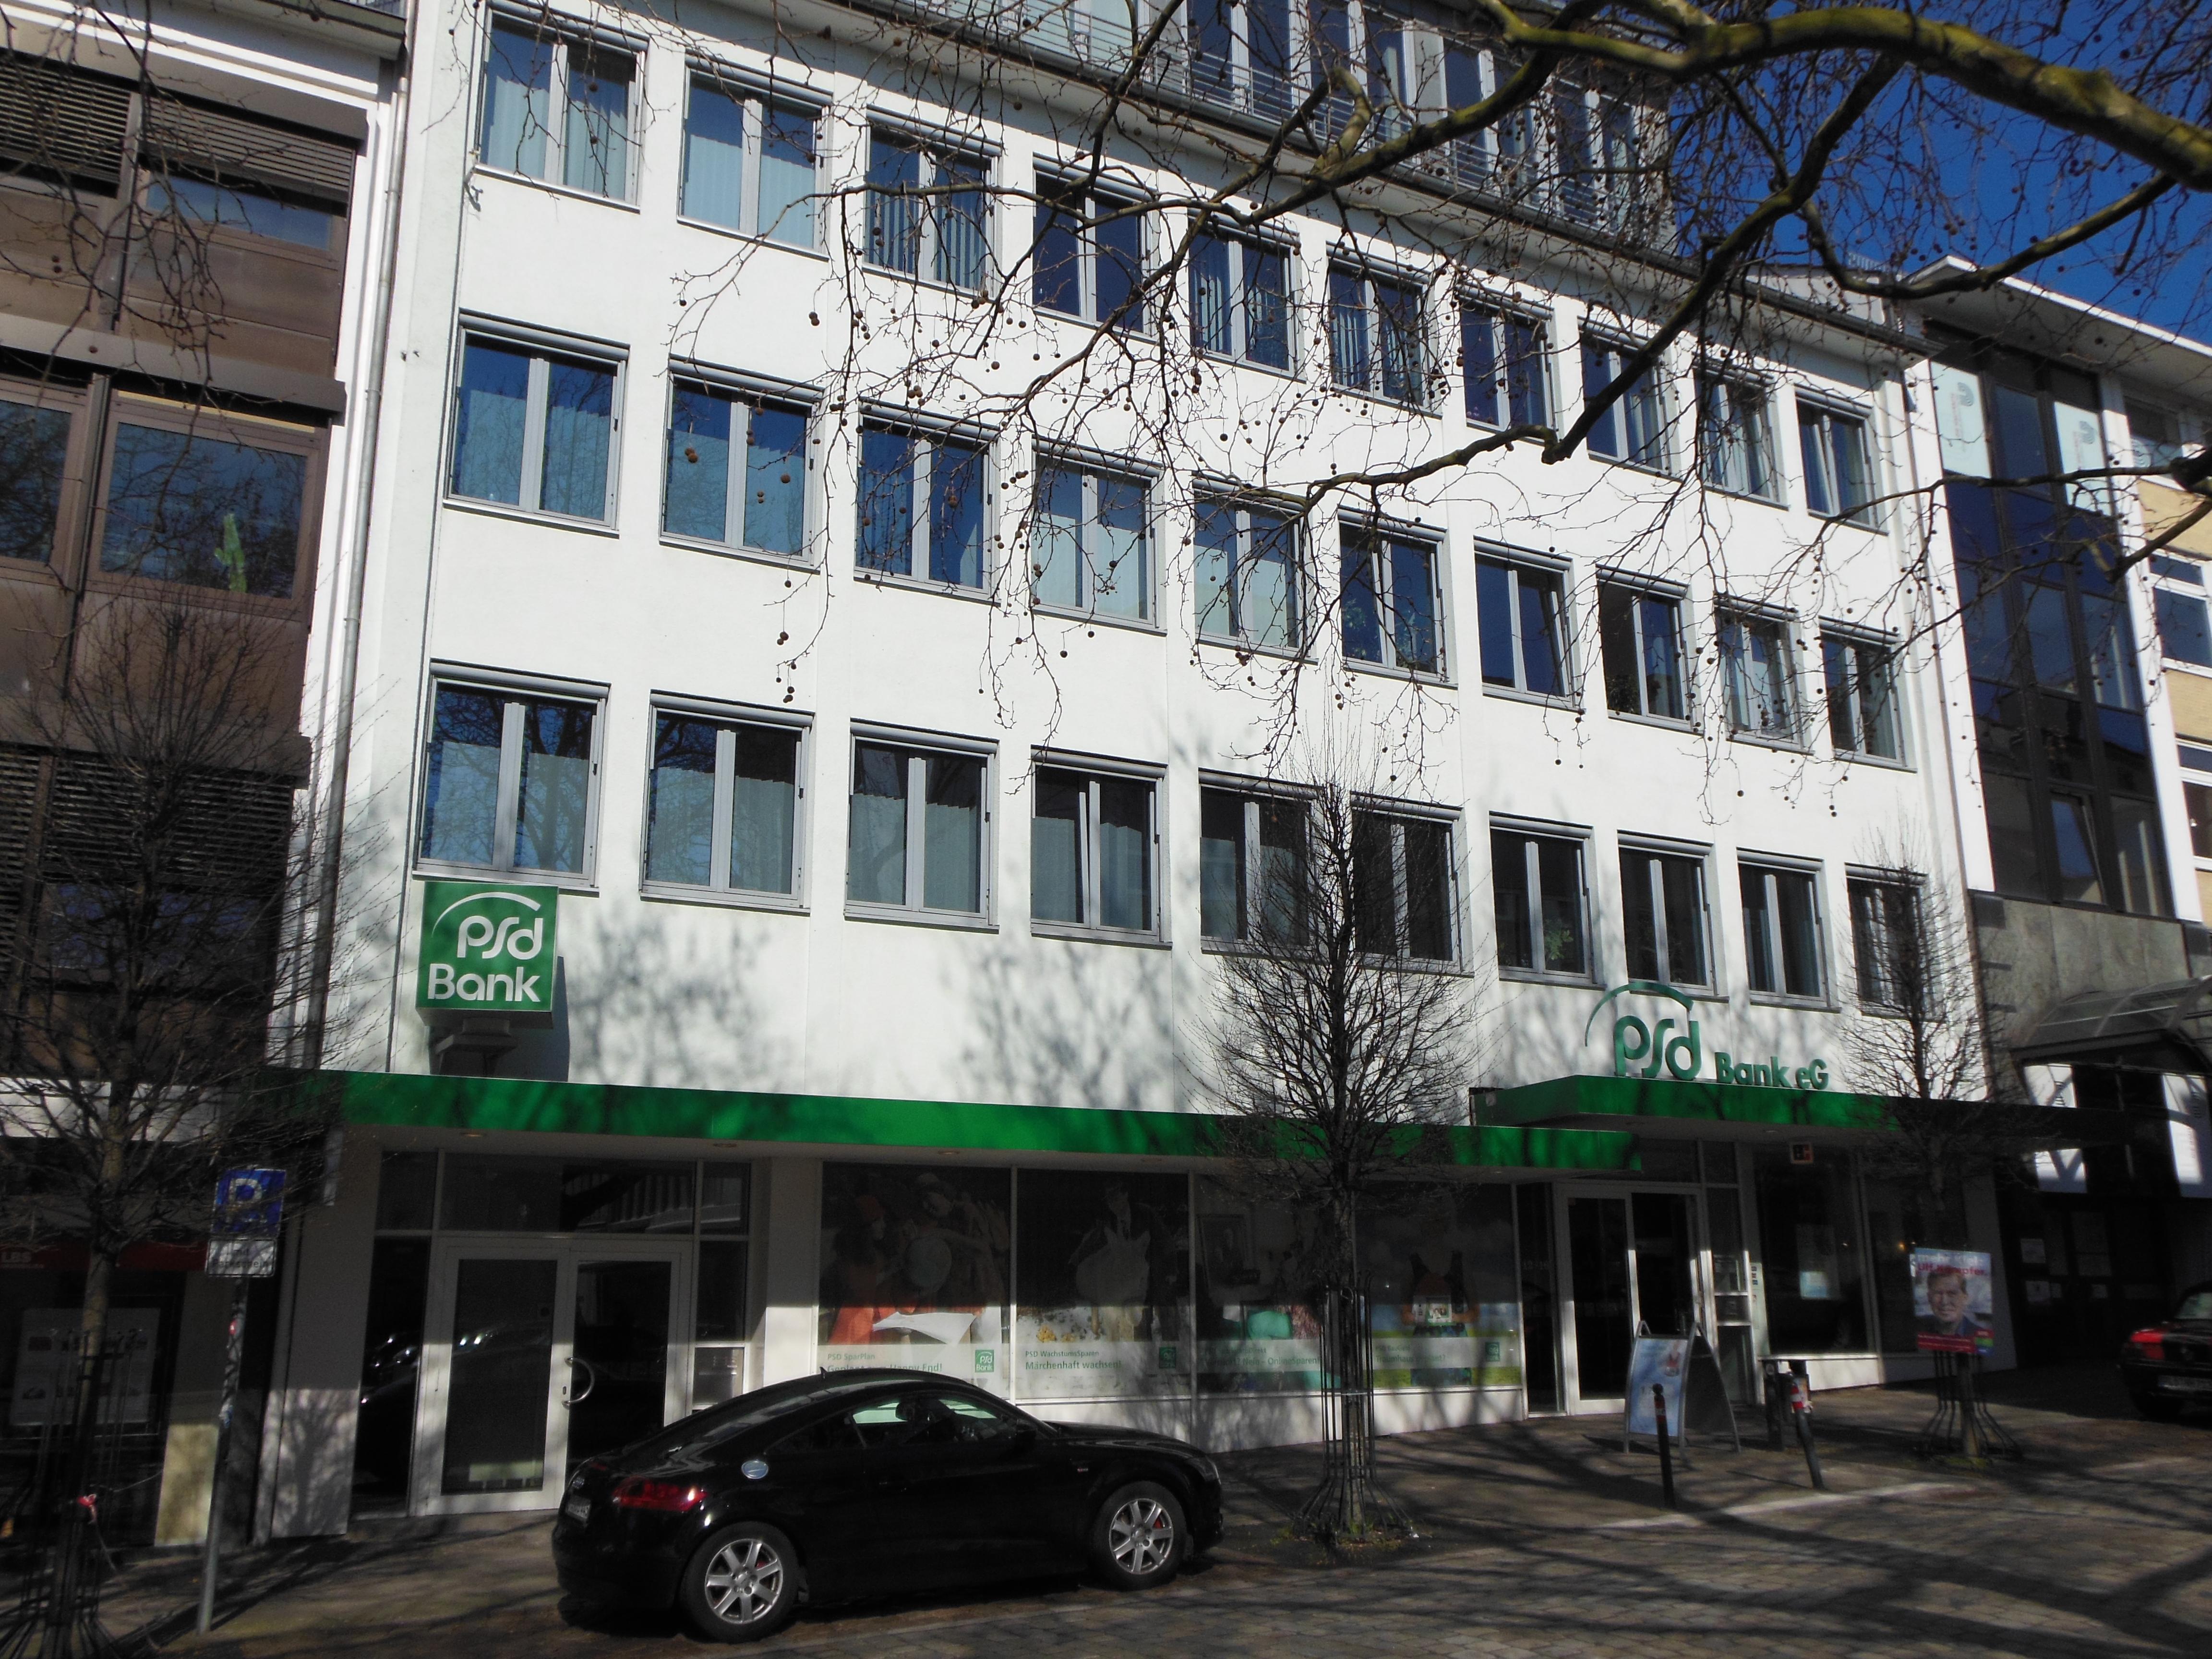 Psd Bank Kiel Eg